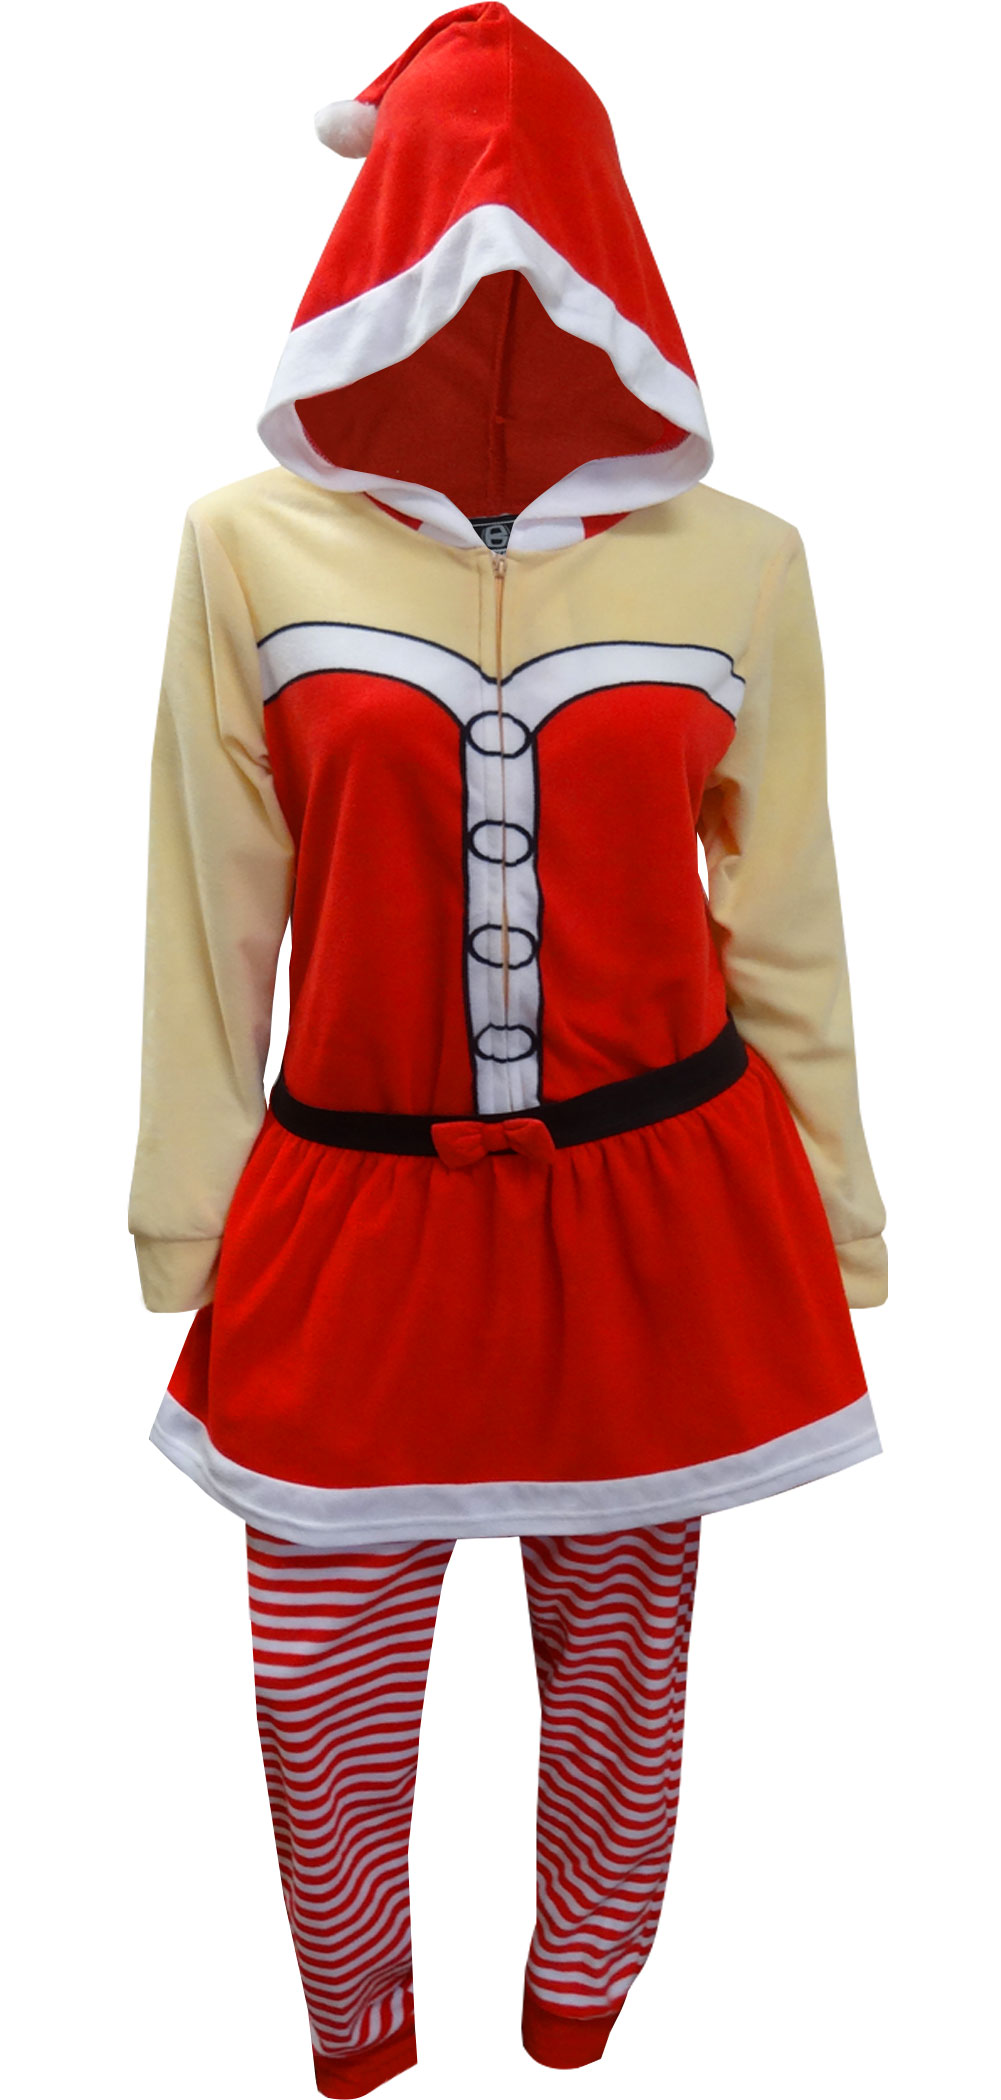 2e56aedf28c5 WebUndies.com Mrs Santa Claus Onesie Hooded Skirted Union Suit Pajama